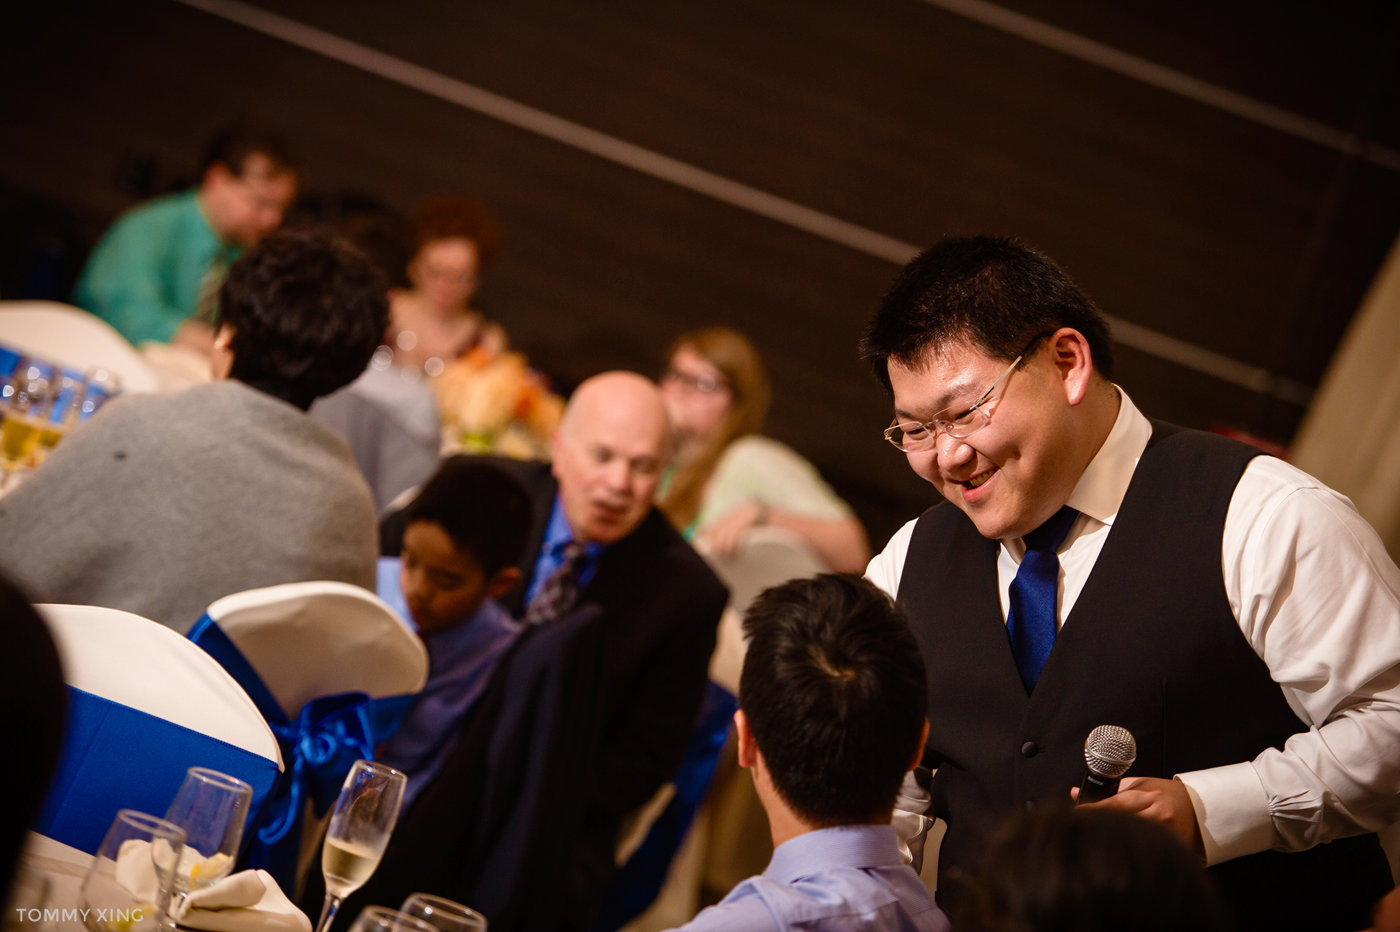 STANFORD MEMORIAL CHURCH WEDDING - Wenjie & Chengcheng - SAN FRANCISCO BAY AREA 斯坦福教堂婚礼跟拍 - 洛杉矶婚礼婚纱照摄影师 Tommy Xing Photography214.jpg